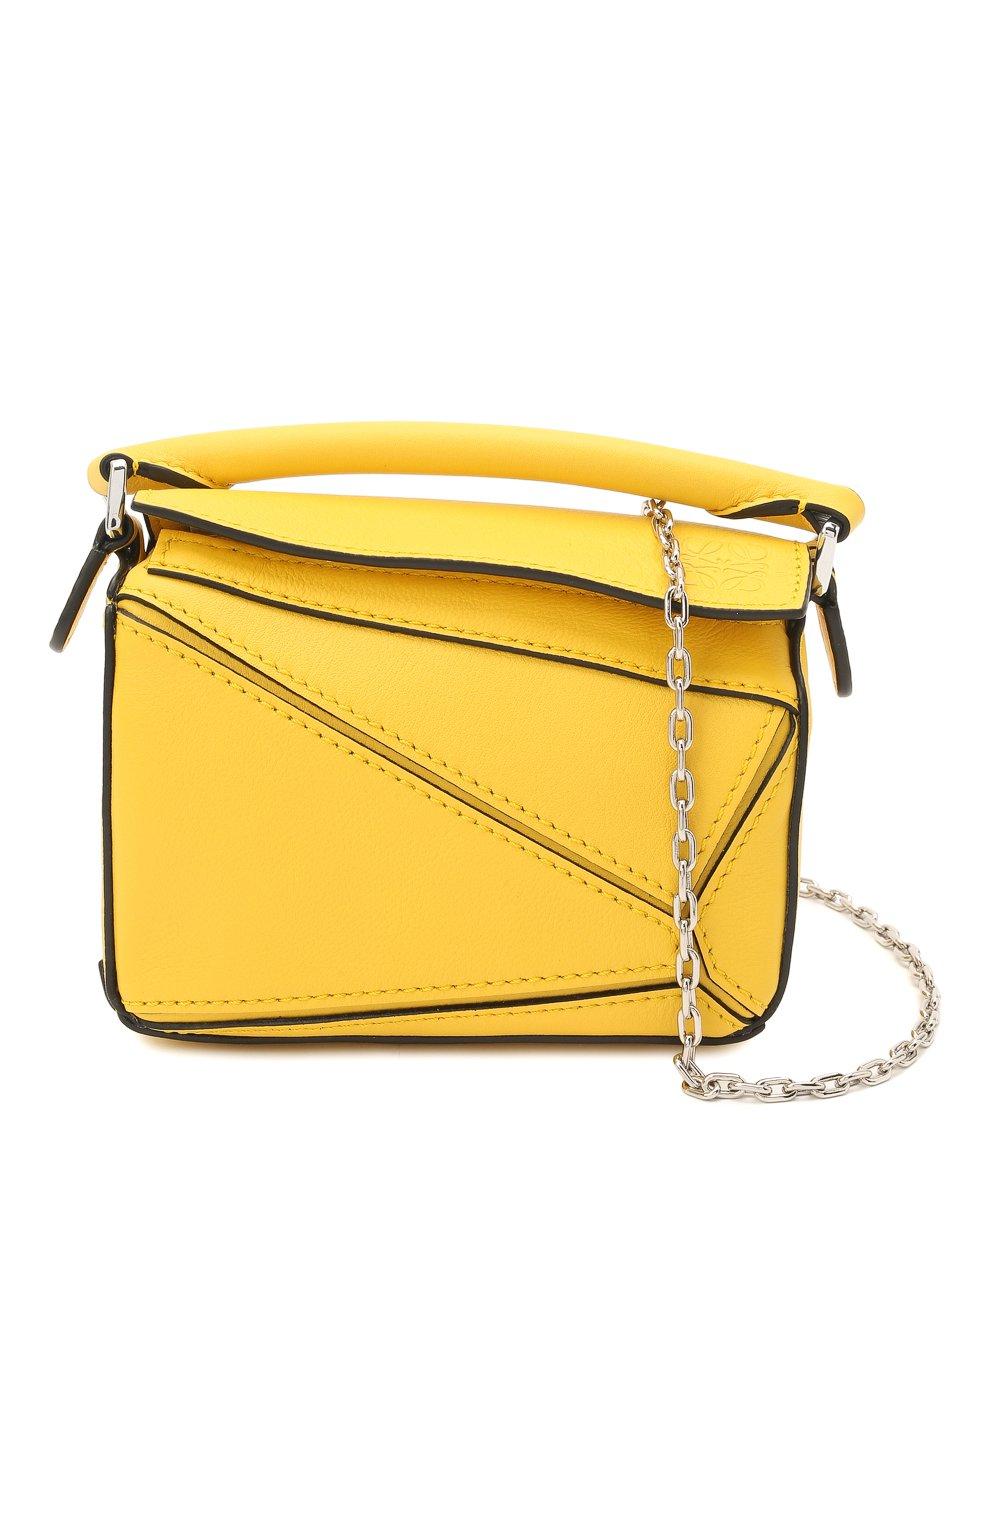 Женская сумка puzzle nano LOEWE желтого цвета, арт. A510U98X01 | Фото 6 (Ремень/цепочка: С цепочкой, На ремешке; Сумки-технические: Сумки top-handle; Материал: Натуральная кожа; Размер: mini)